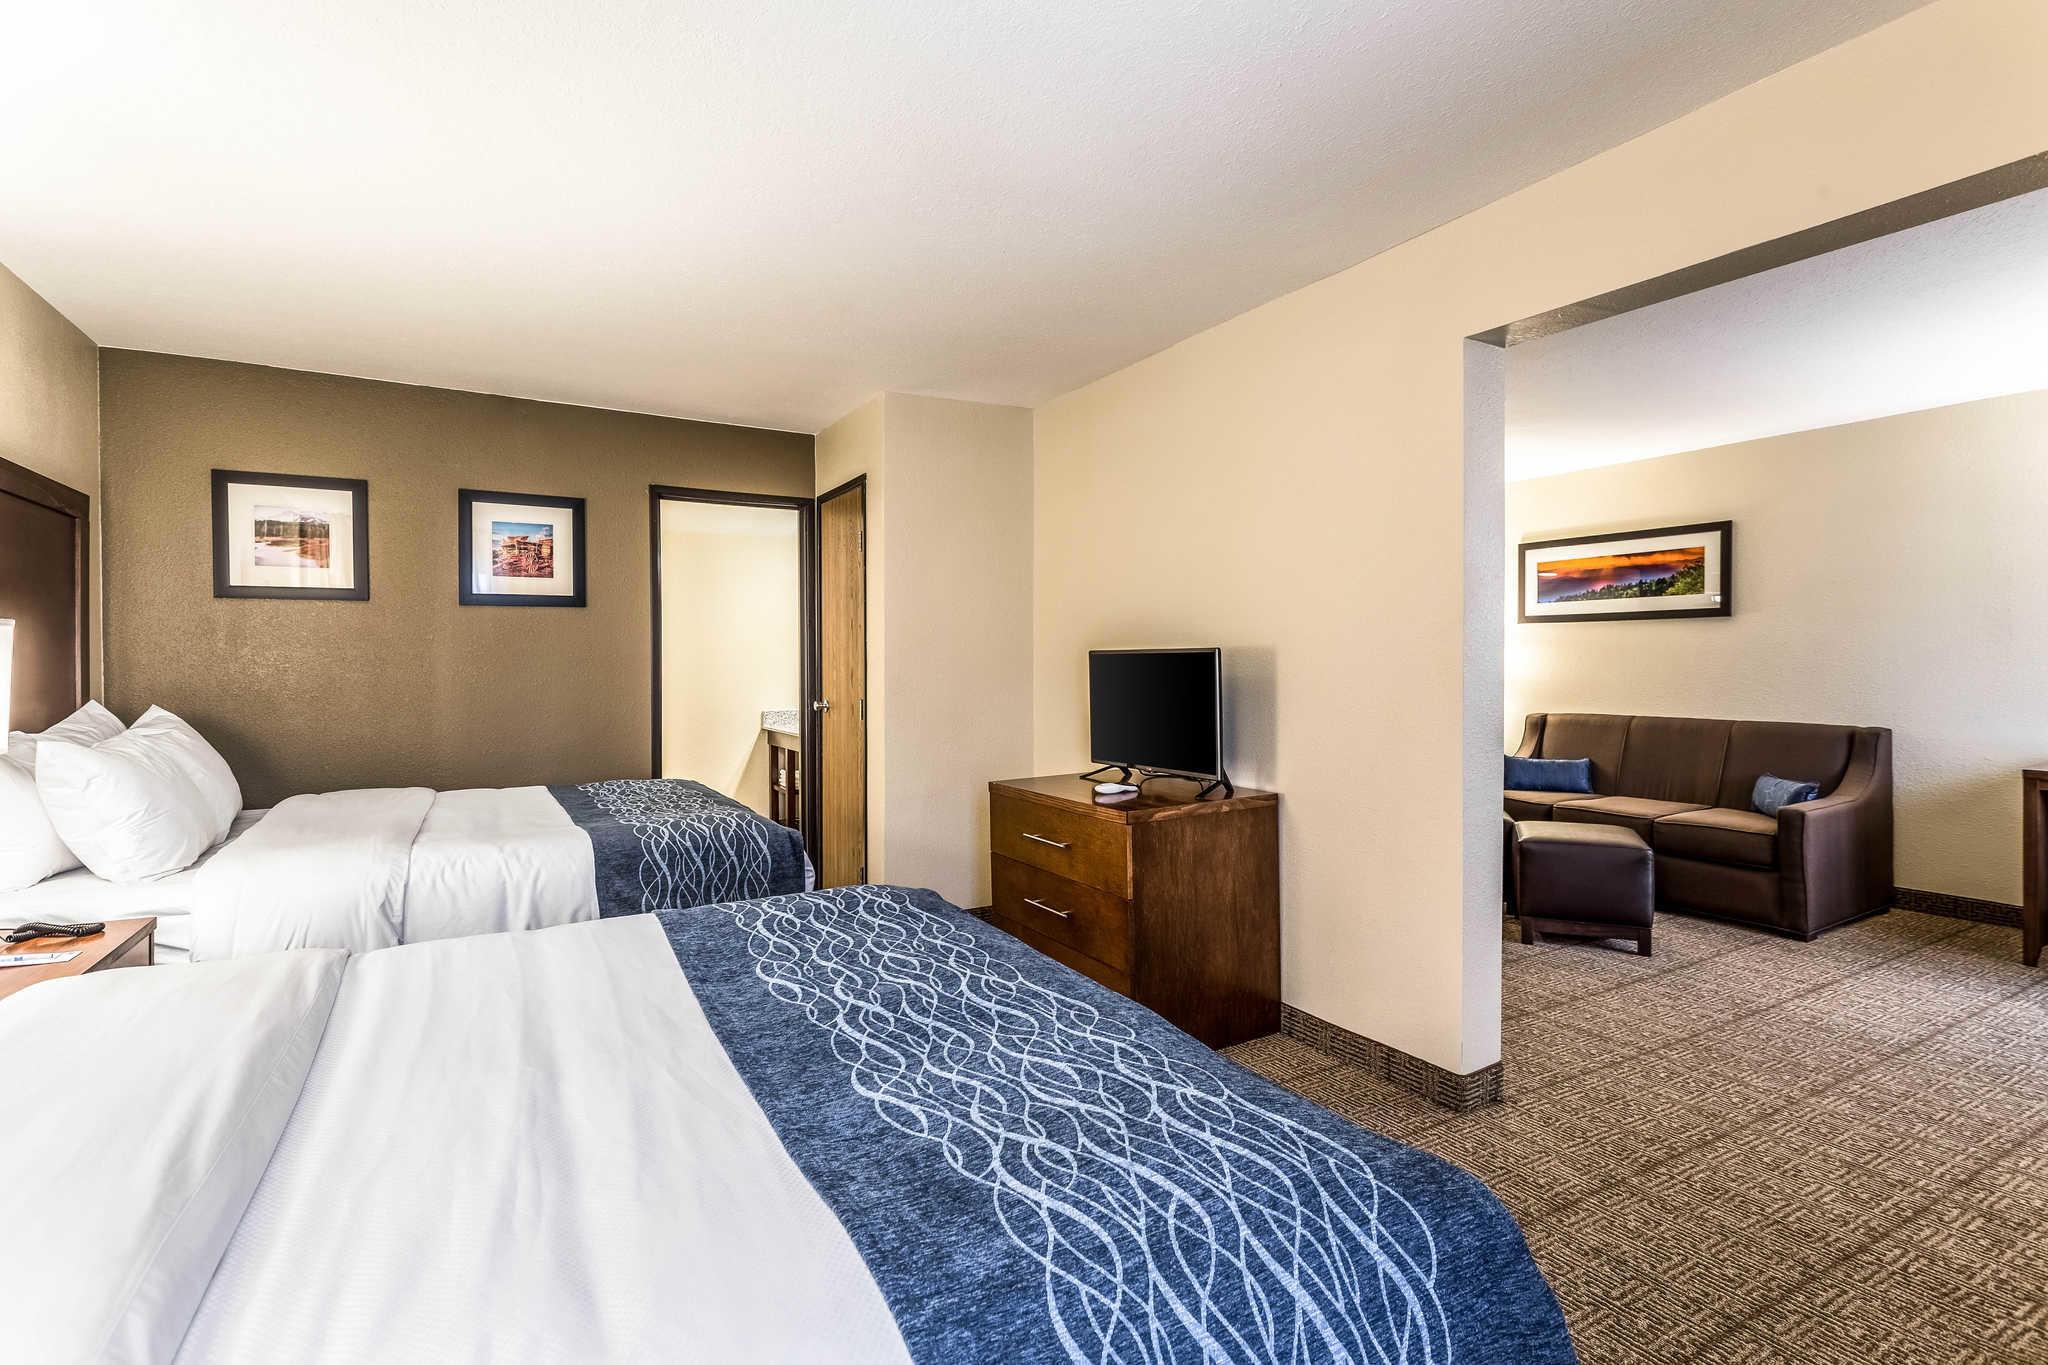 Comfort Inn & Suites Albuquerque Downtown image 24